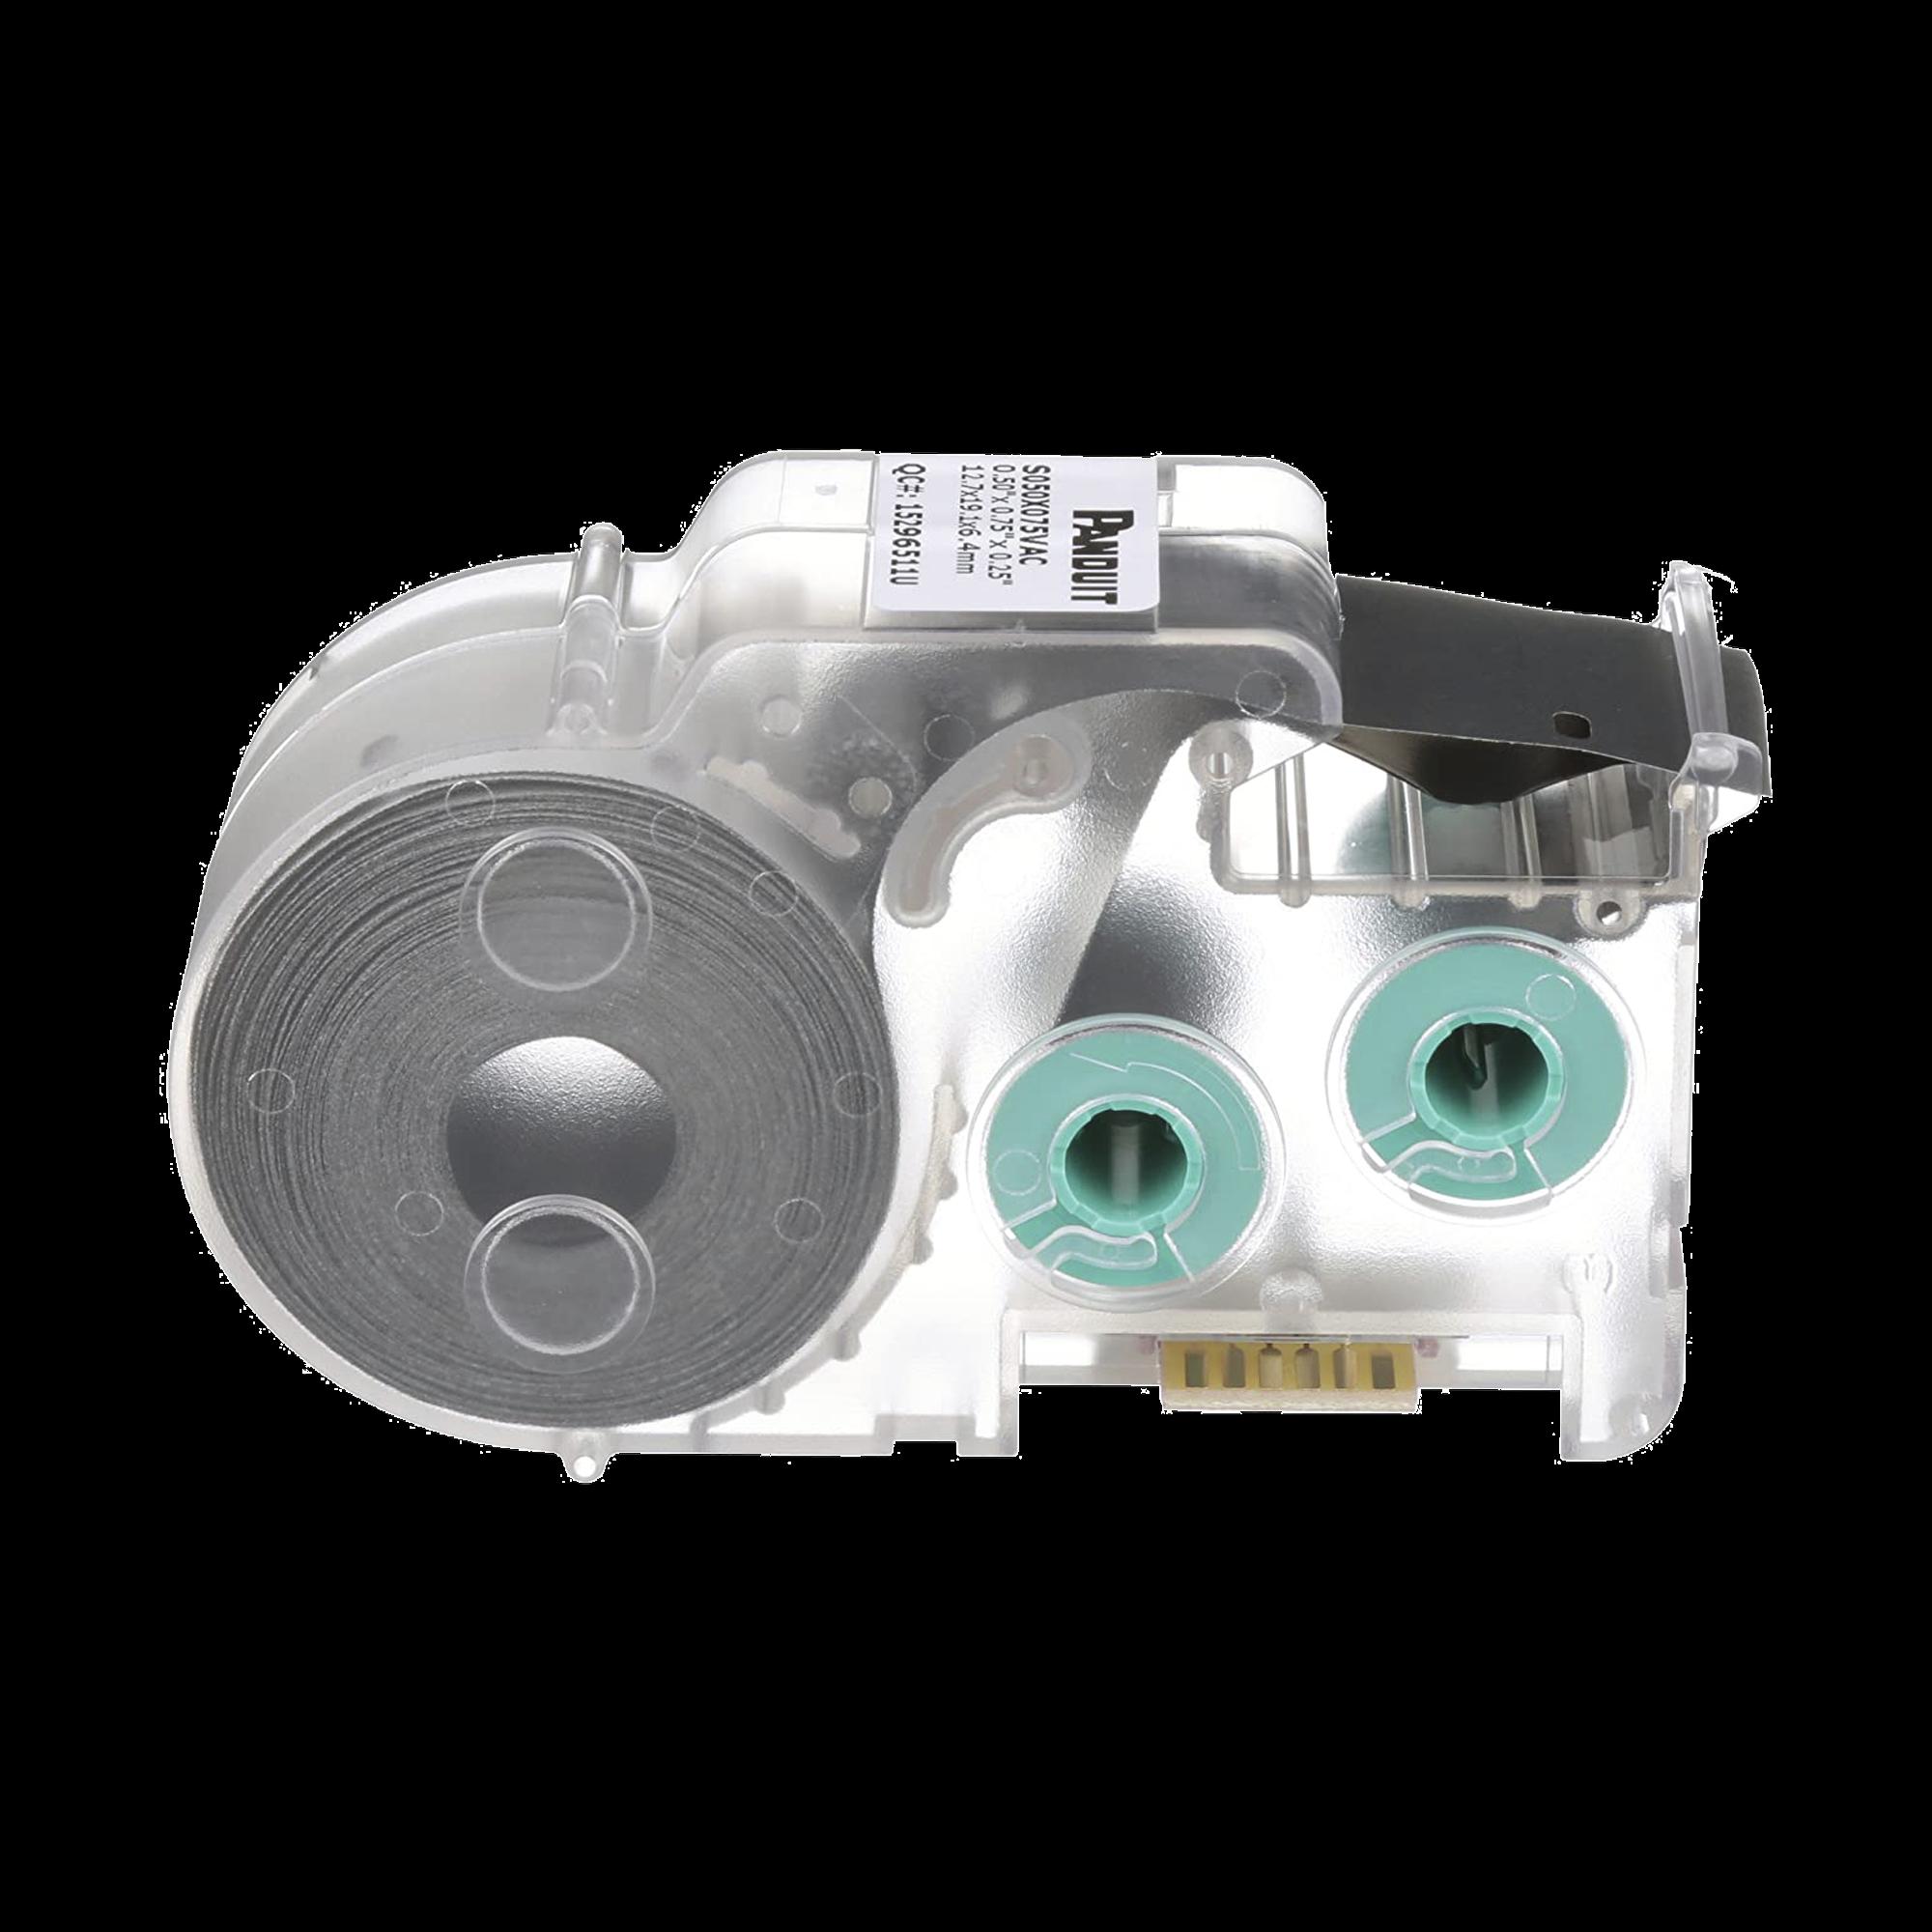 Casete de 350 Etiquetas Autolaminadas de 25.4 x 19.05 mm, para Cables de 2 a 4.1 mm de Diámetro, área de Impresión Color Blanco